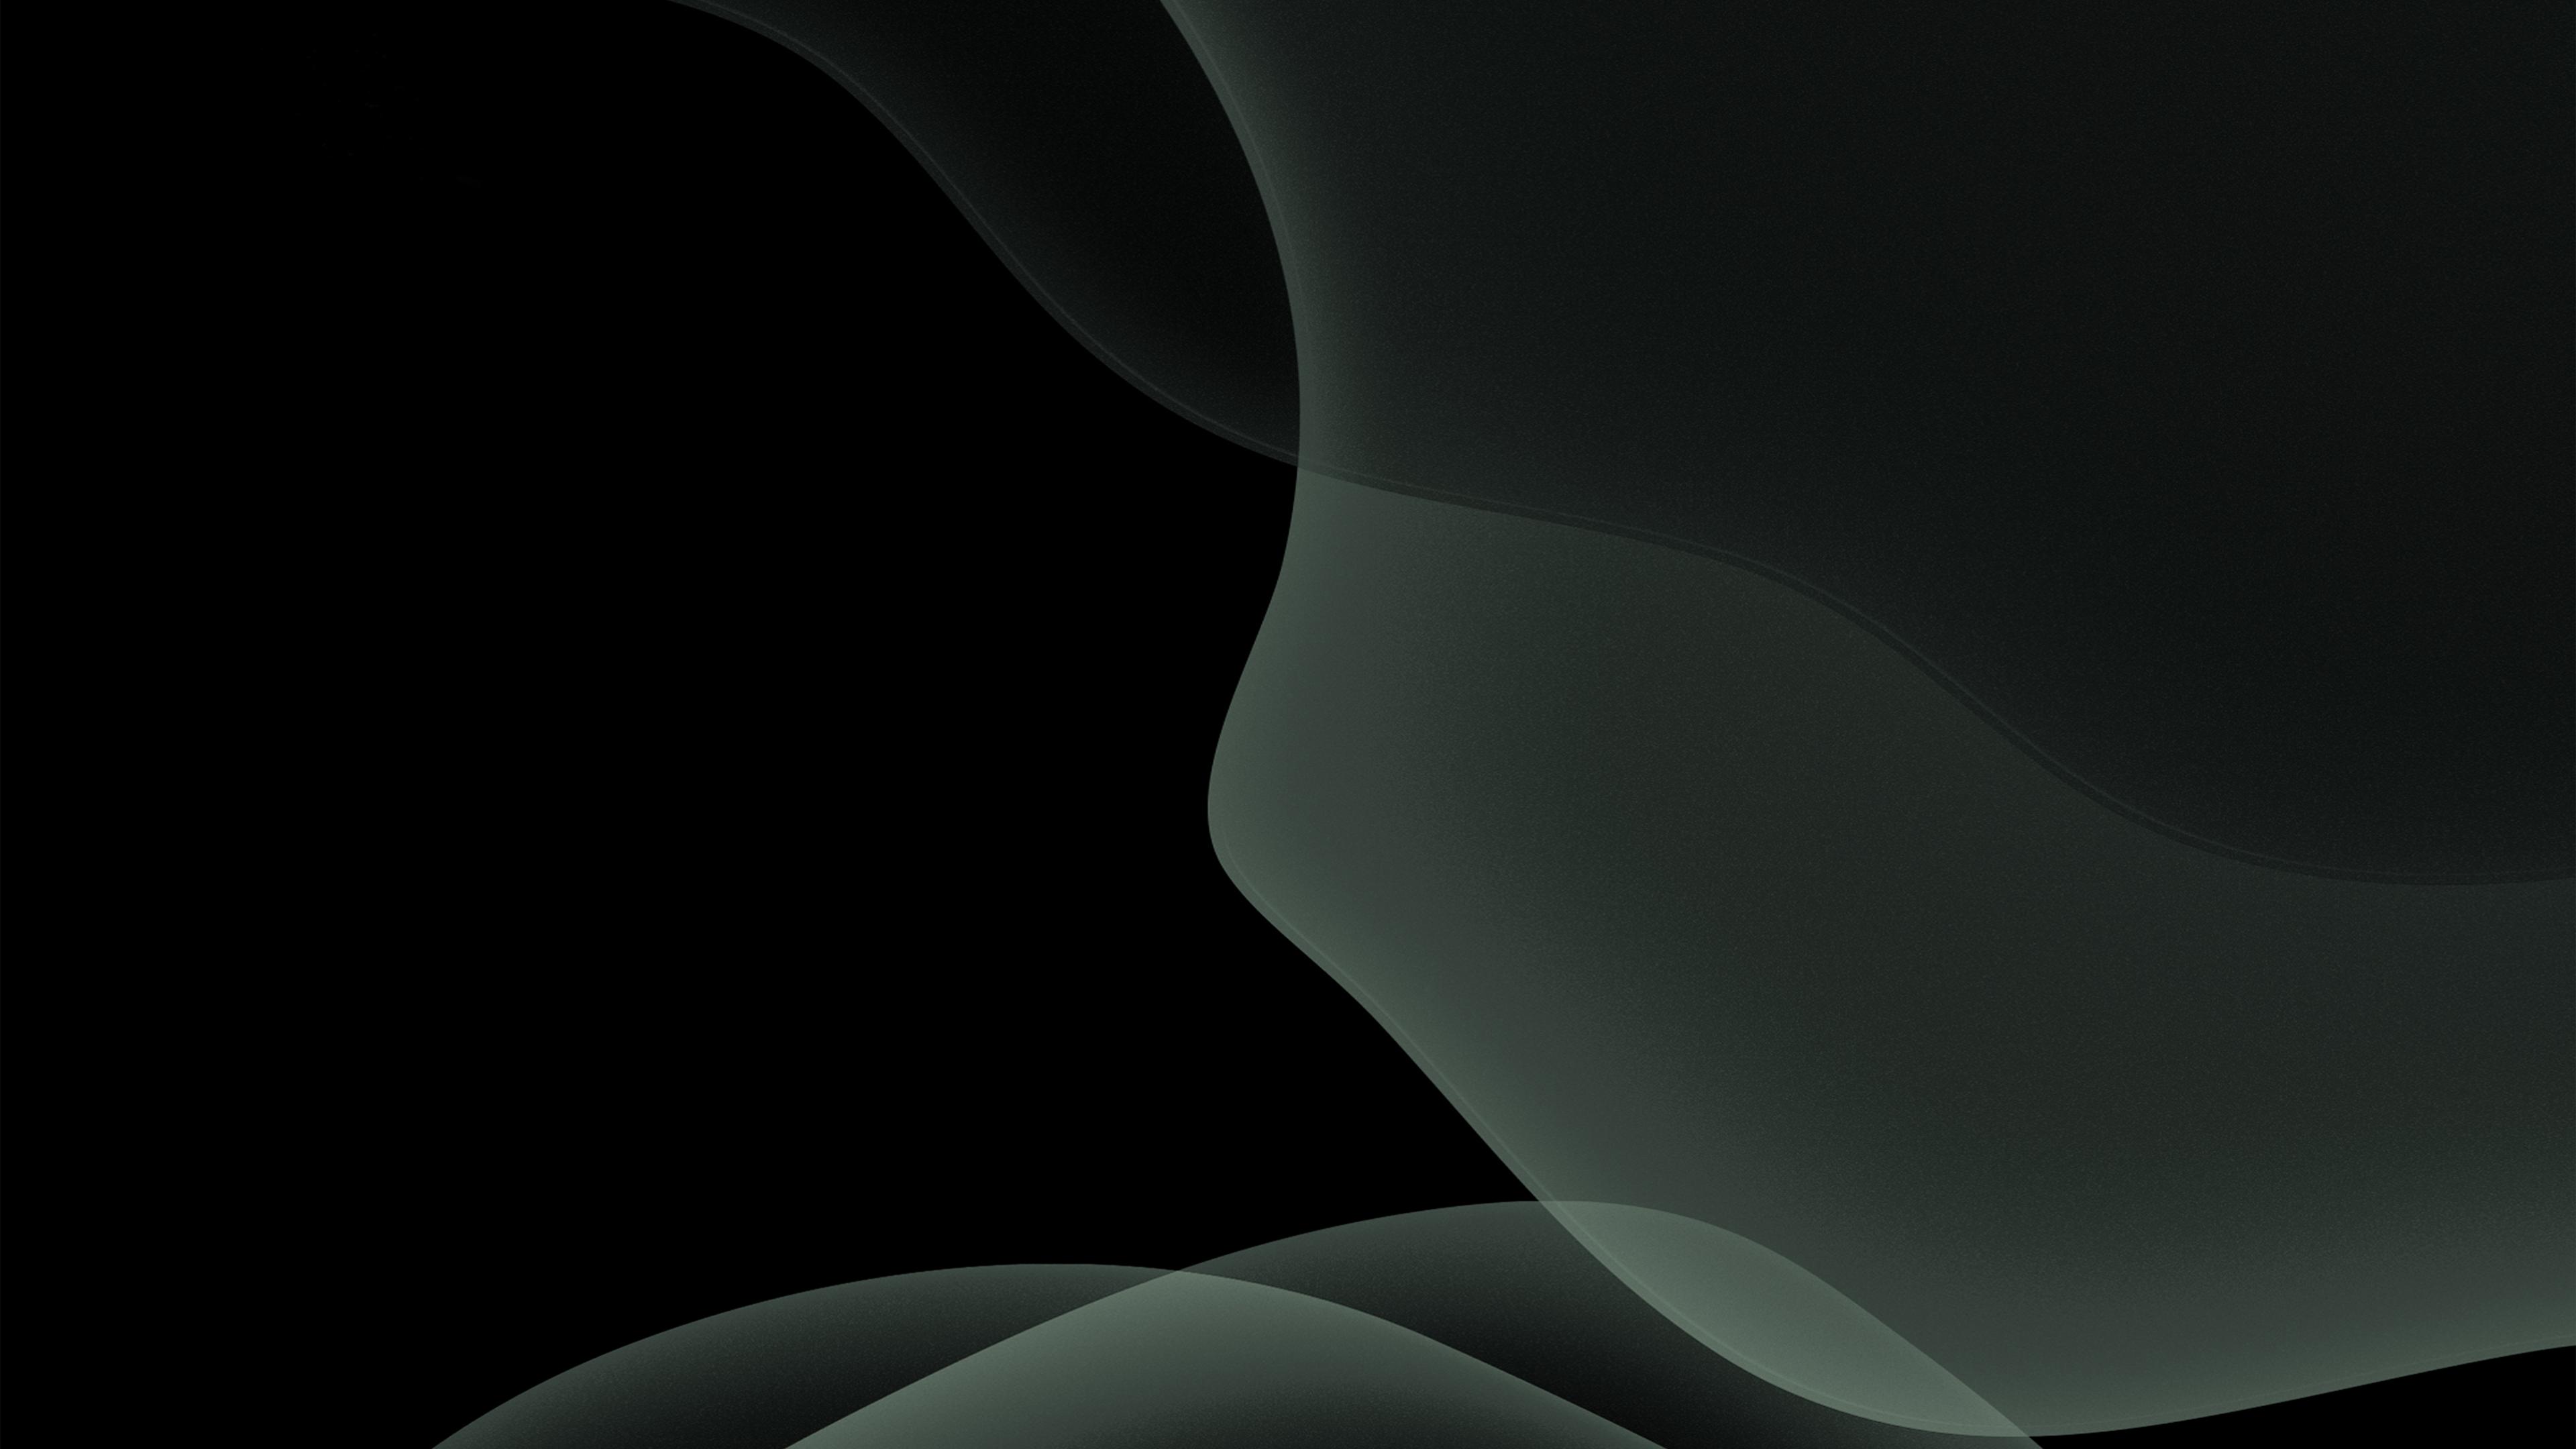 Dark Apple Mac Pro 4k Hd Abstract 4k Wallpapers Images